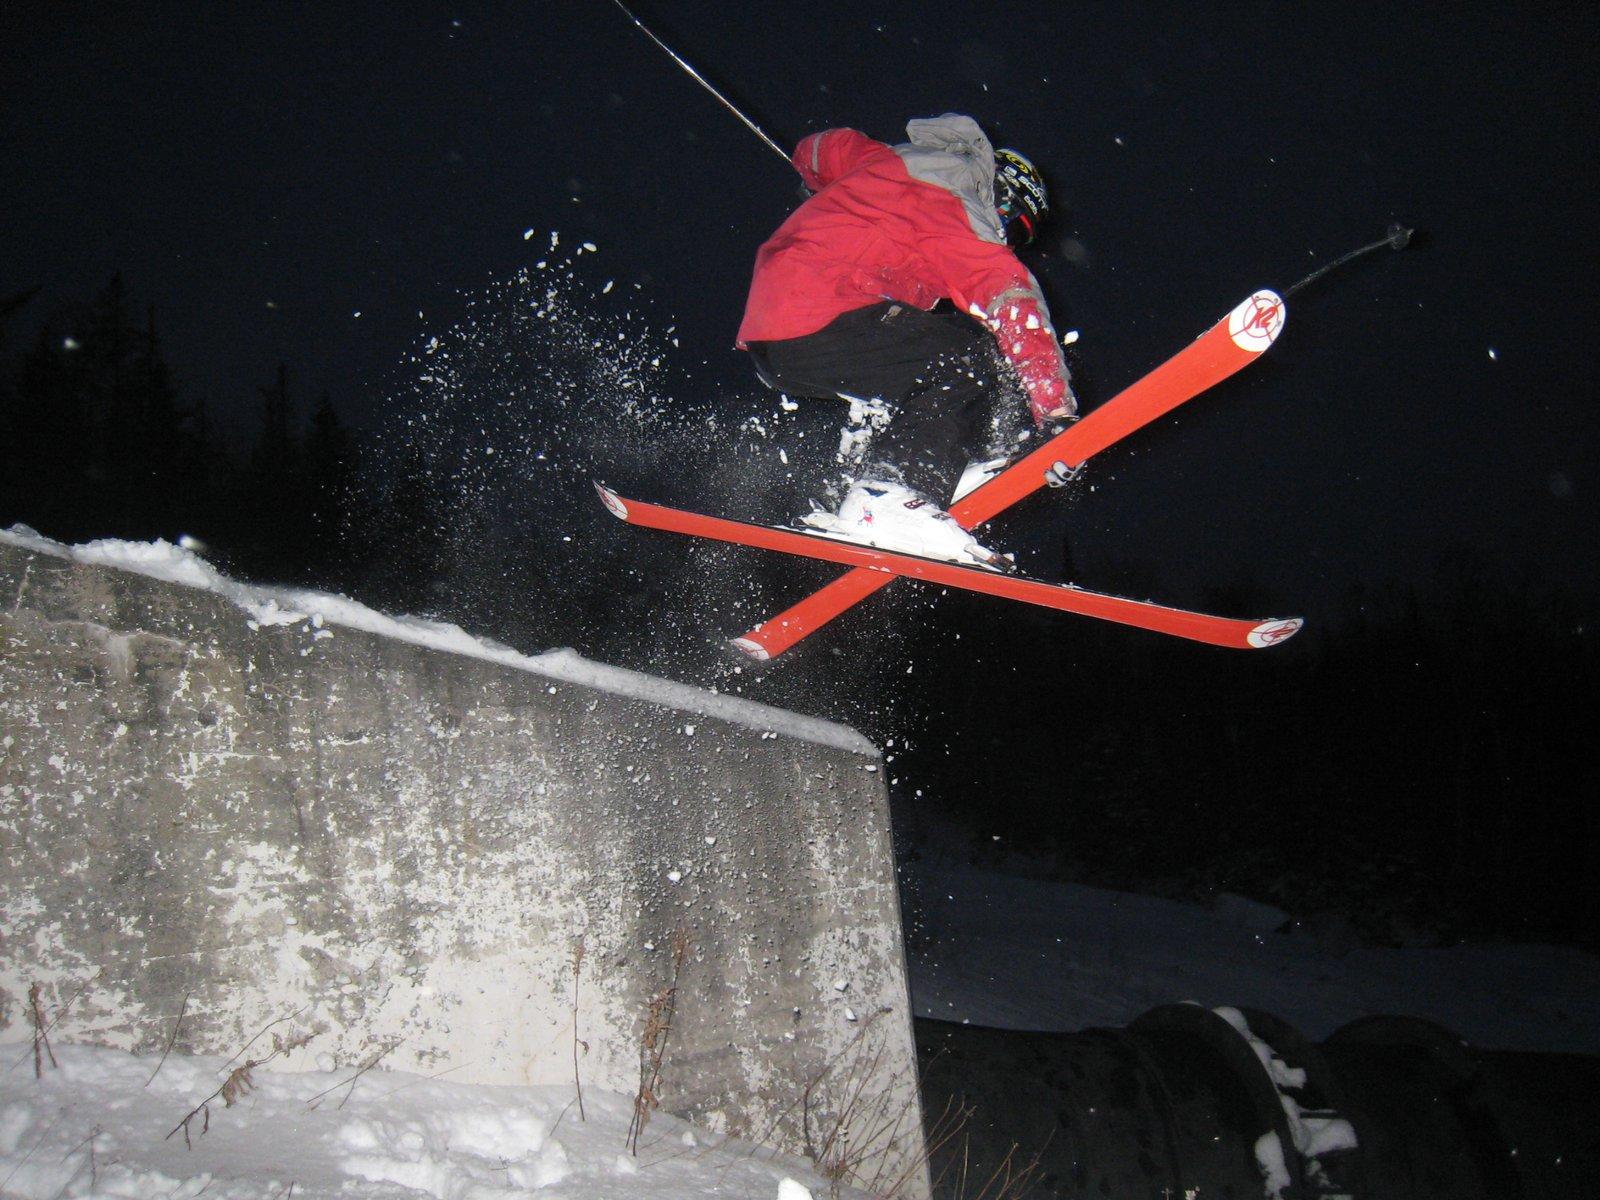 Pipeline skiing